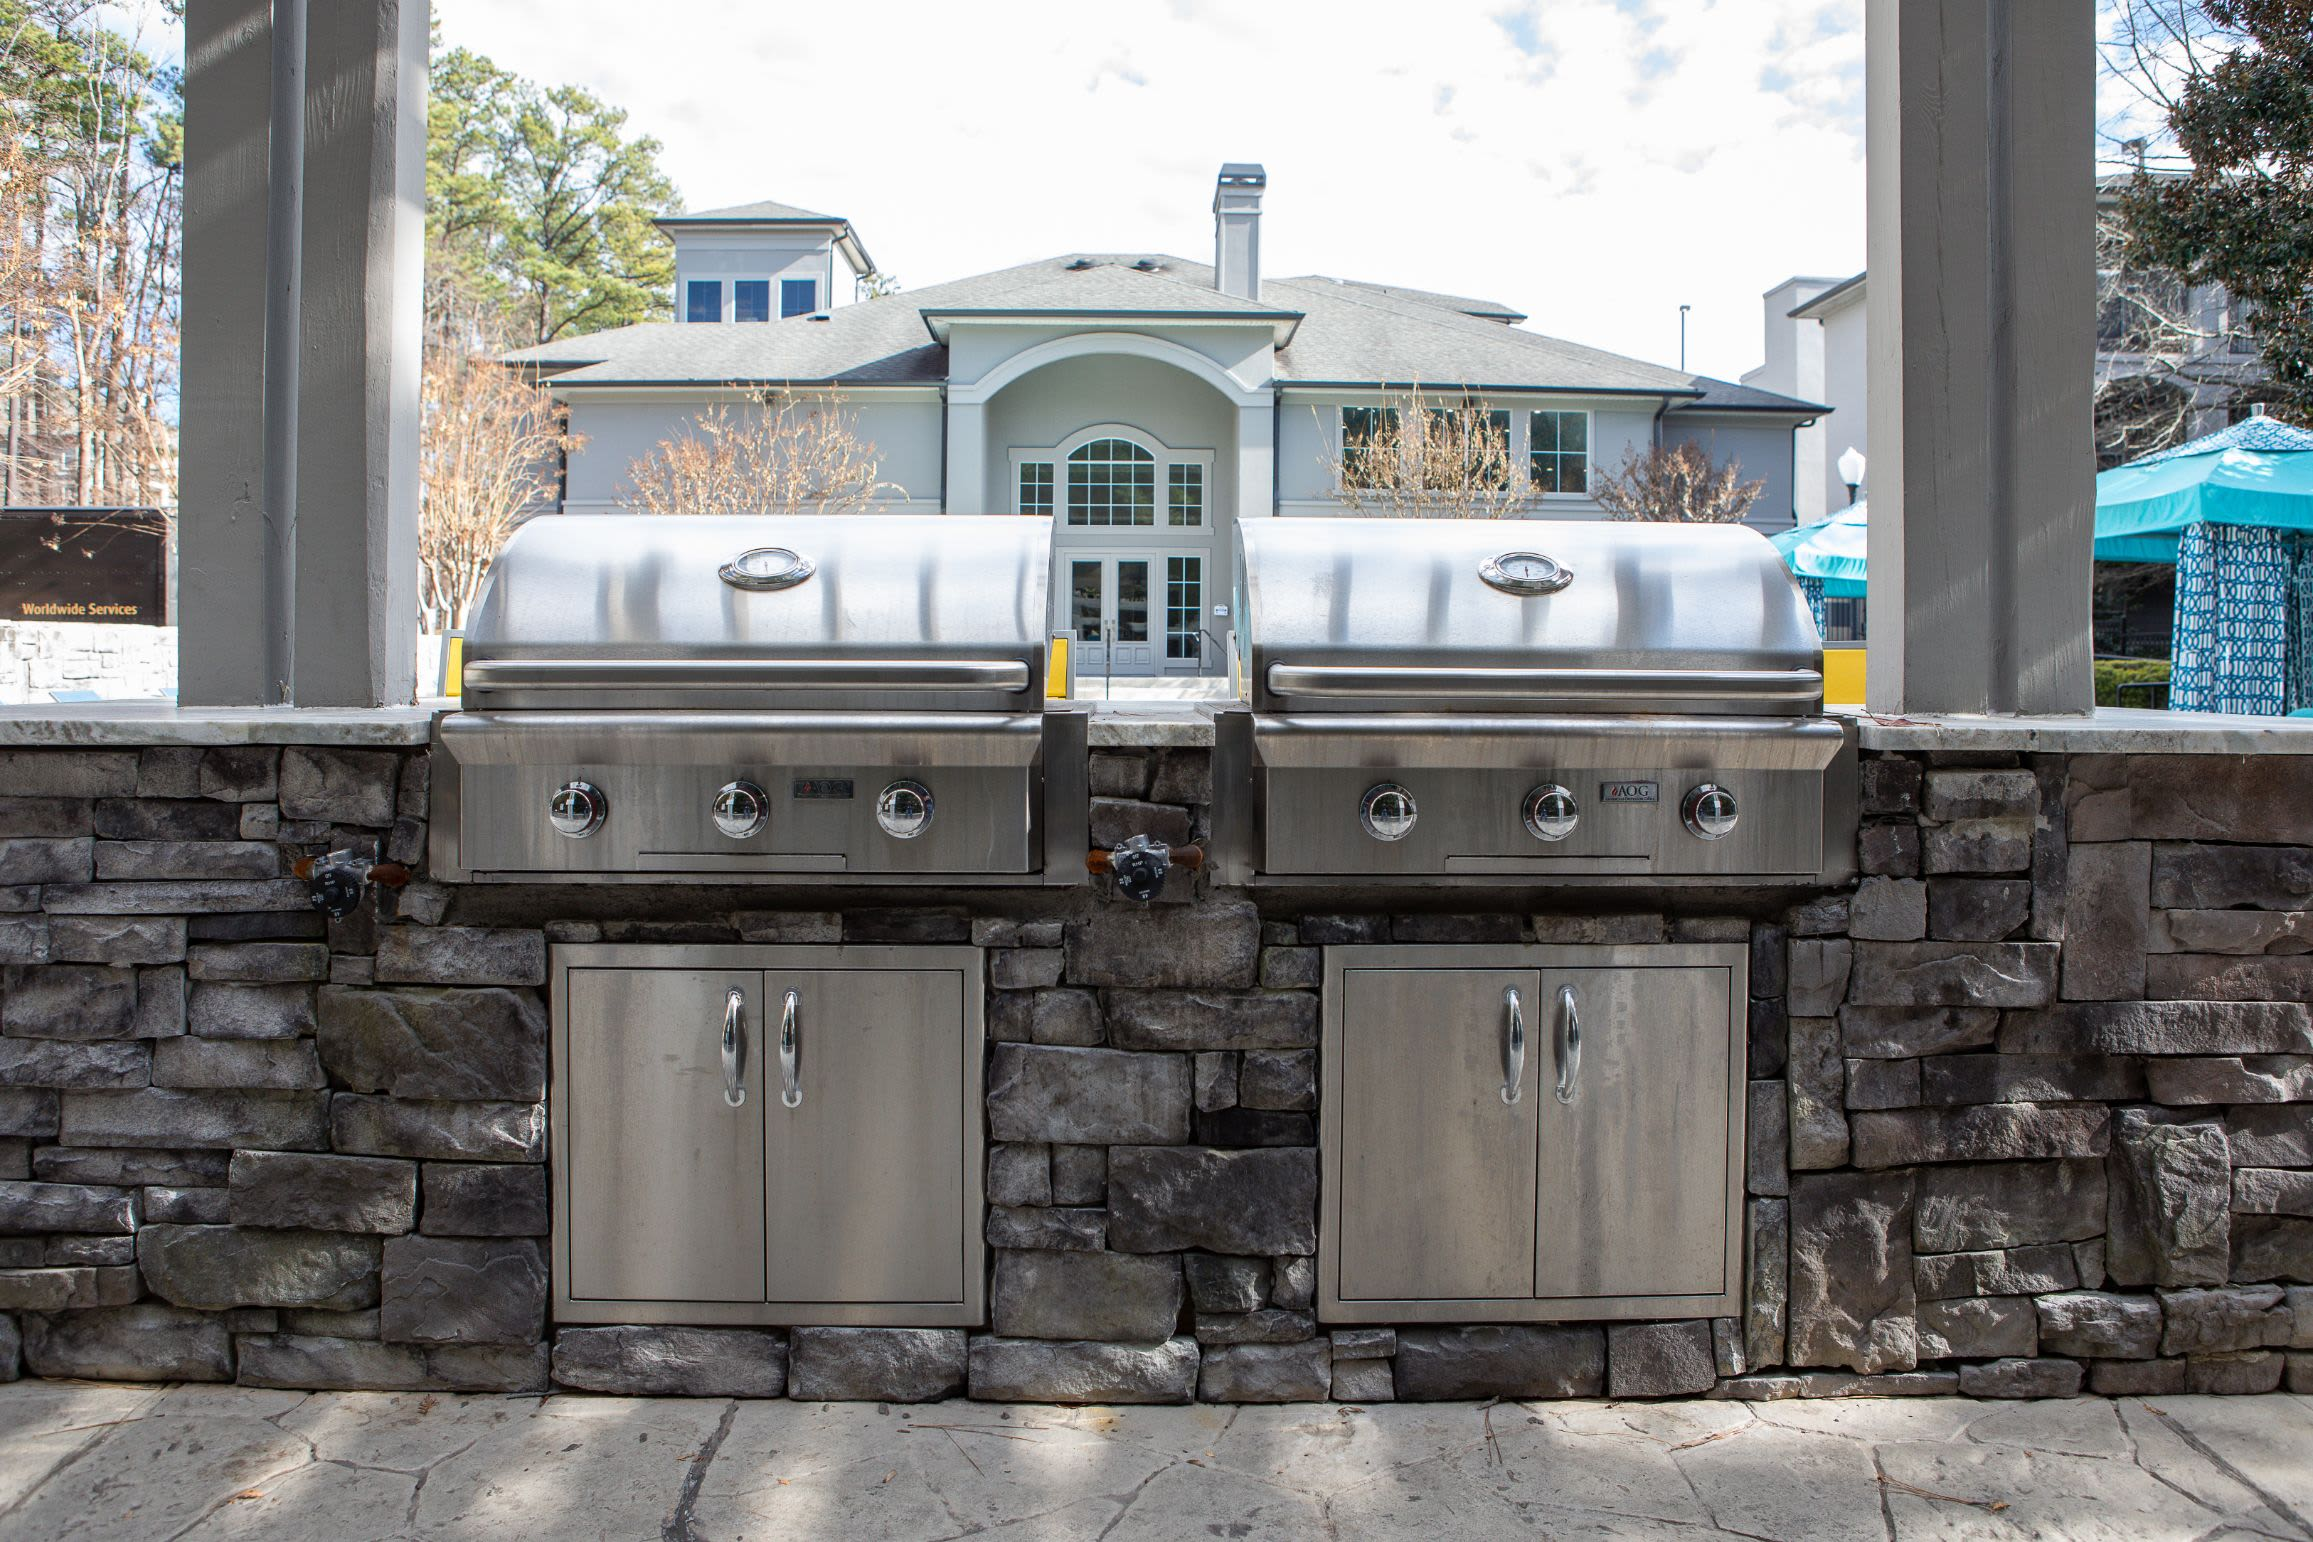 Gas grills near the pool at Marq Perimeter in Atlanta, Georgia